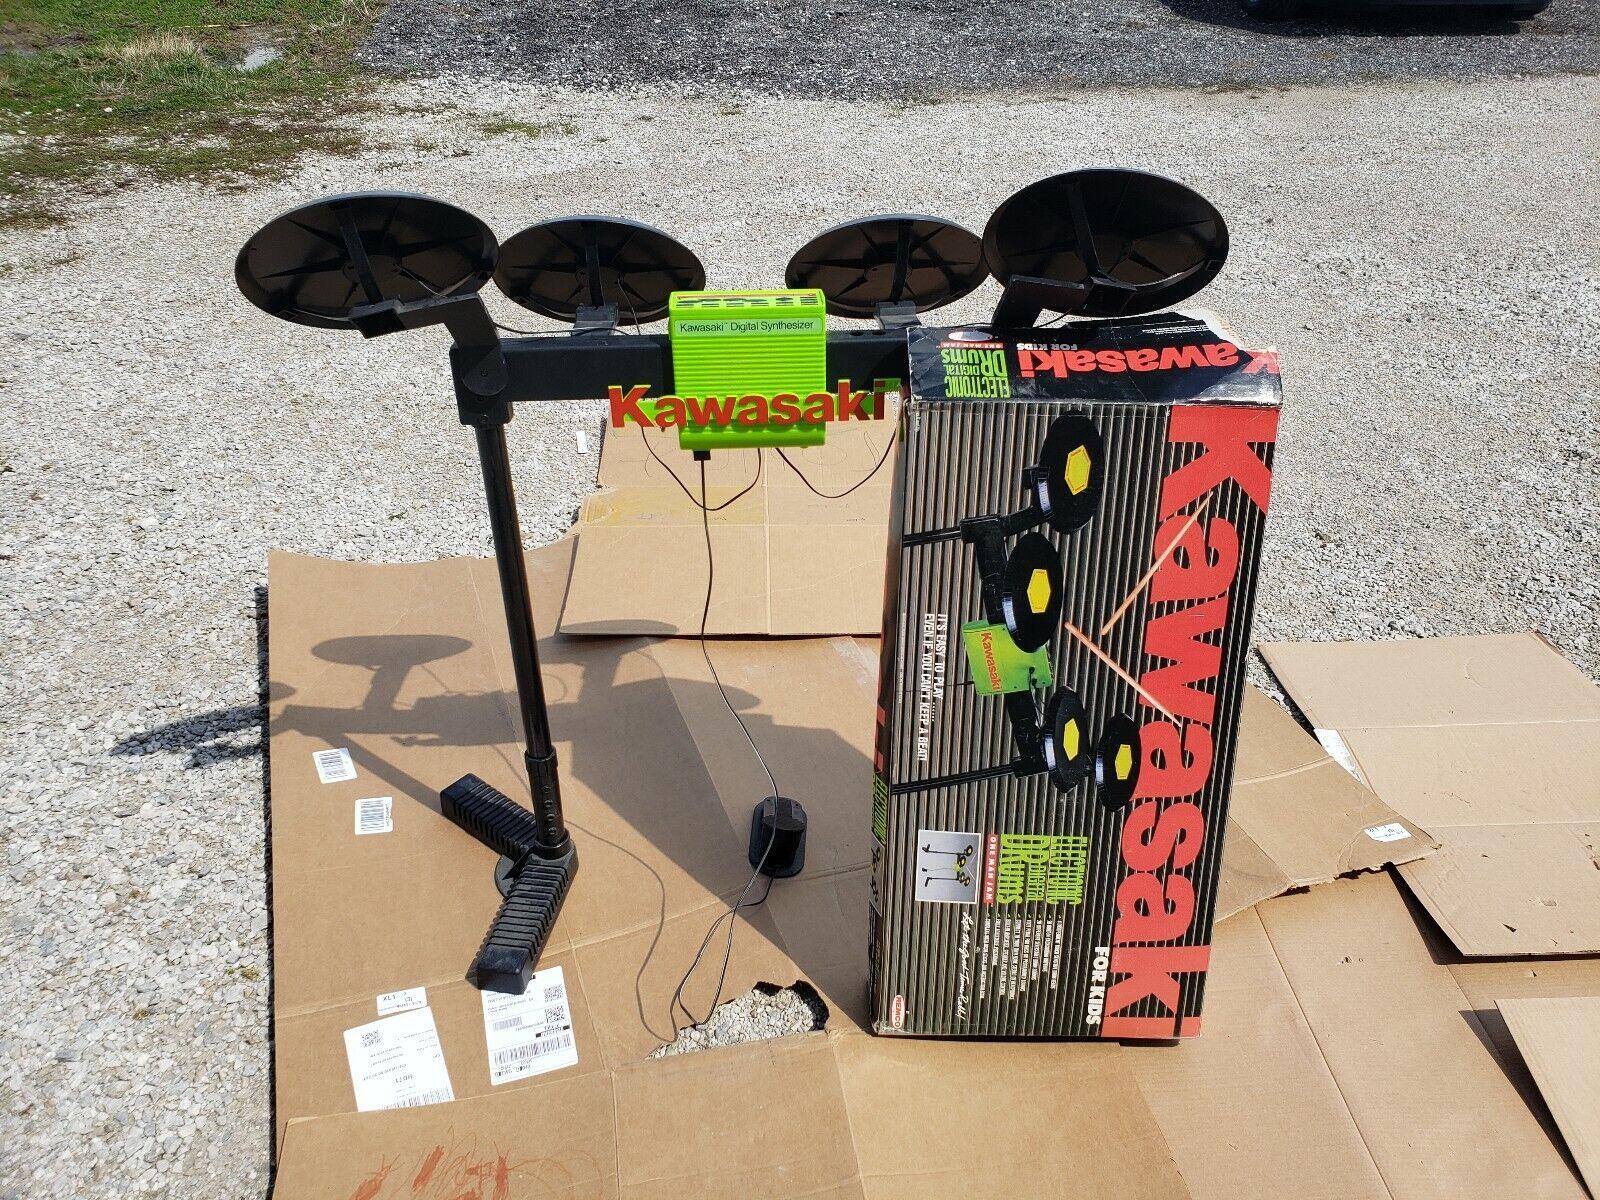 Vintage 1989 Remco Toys Kawasaki Drumset Drumset Drumset working digital midi ee1e4c